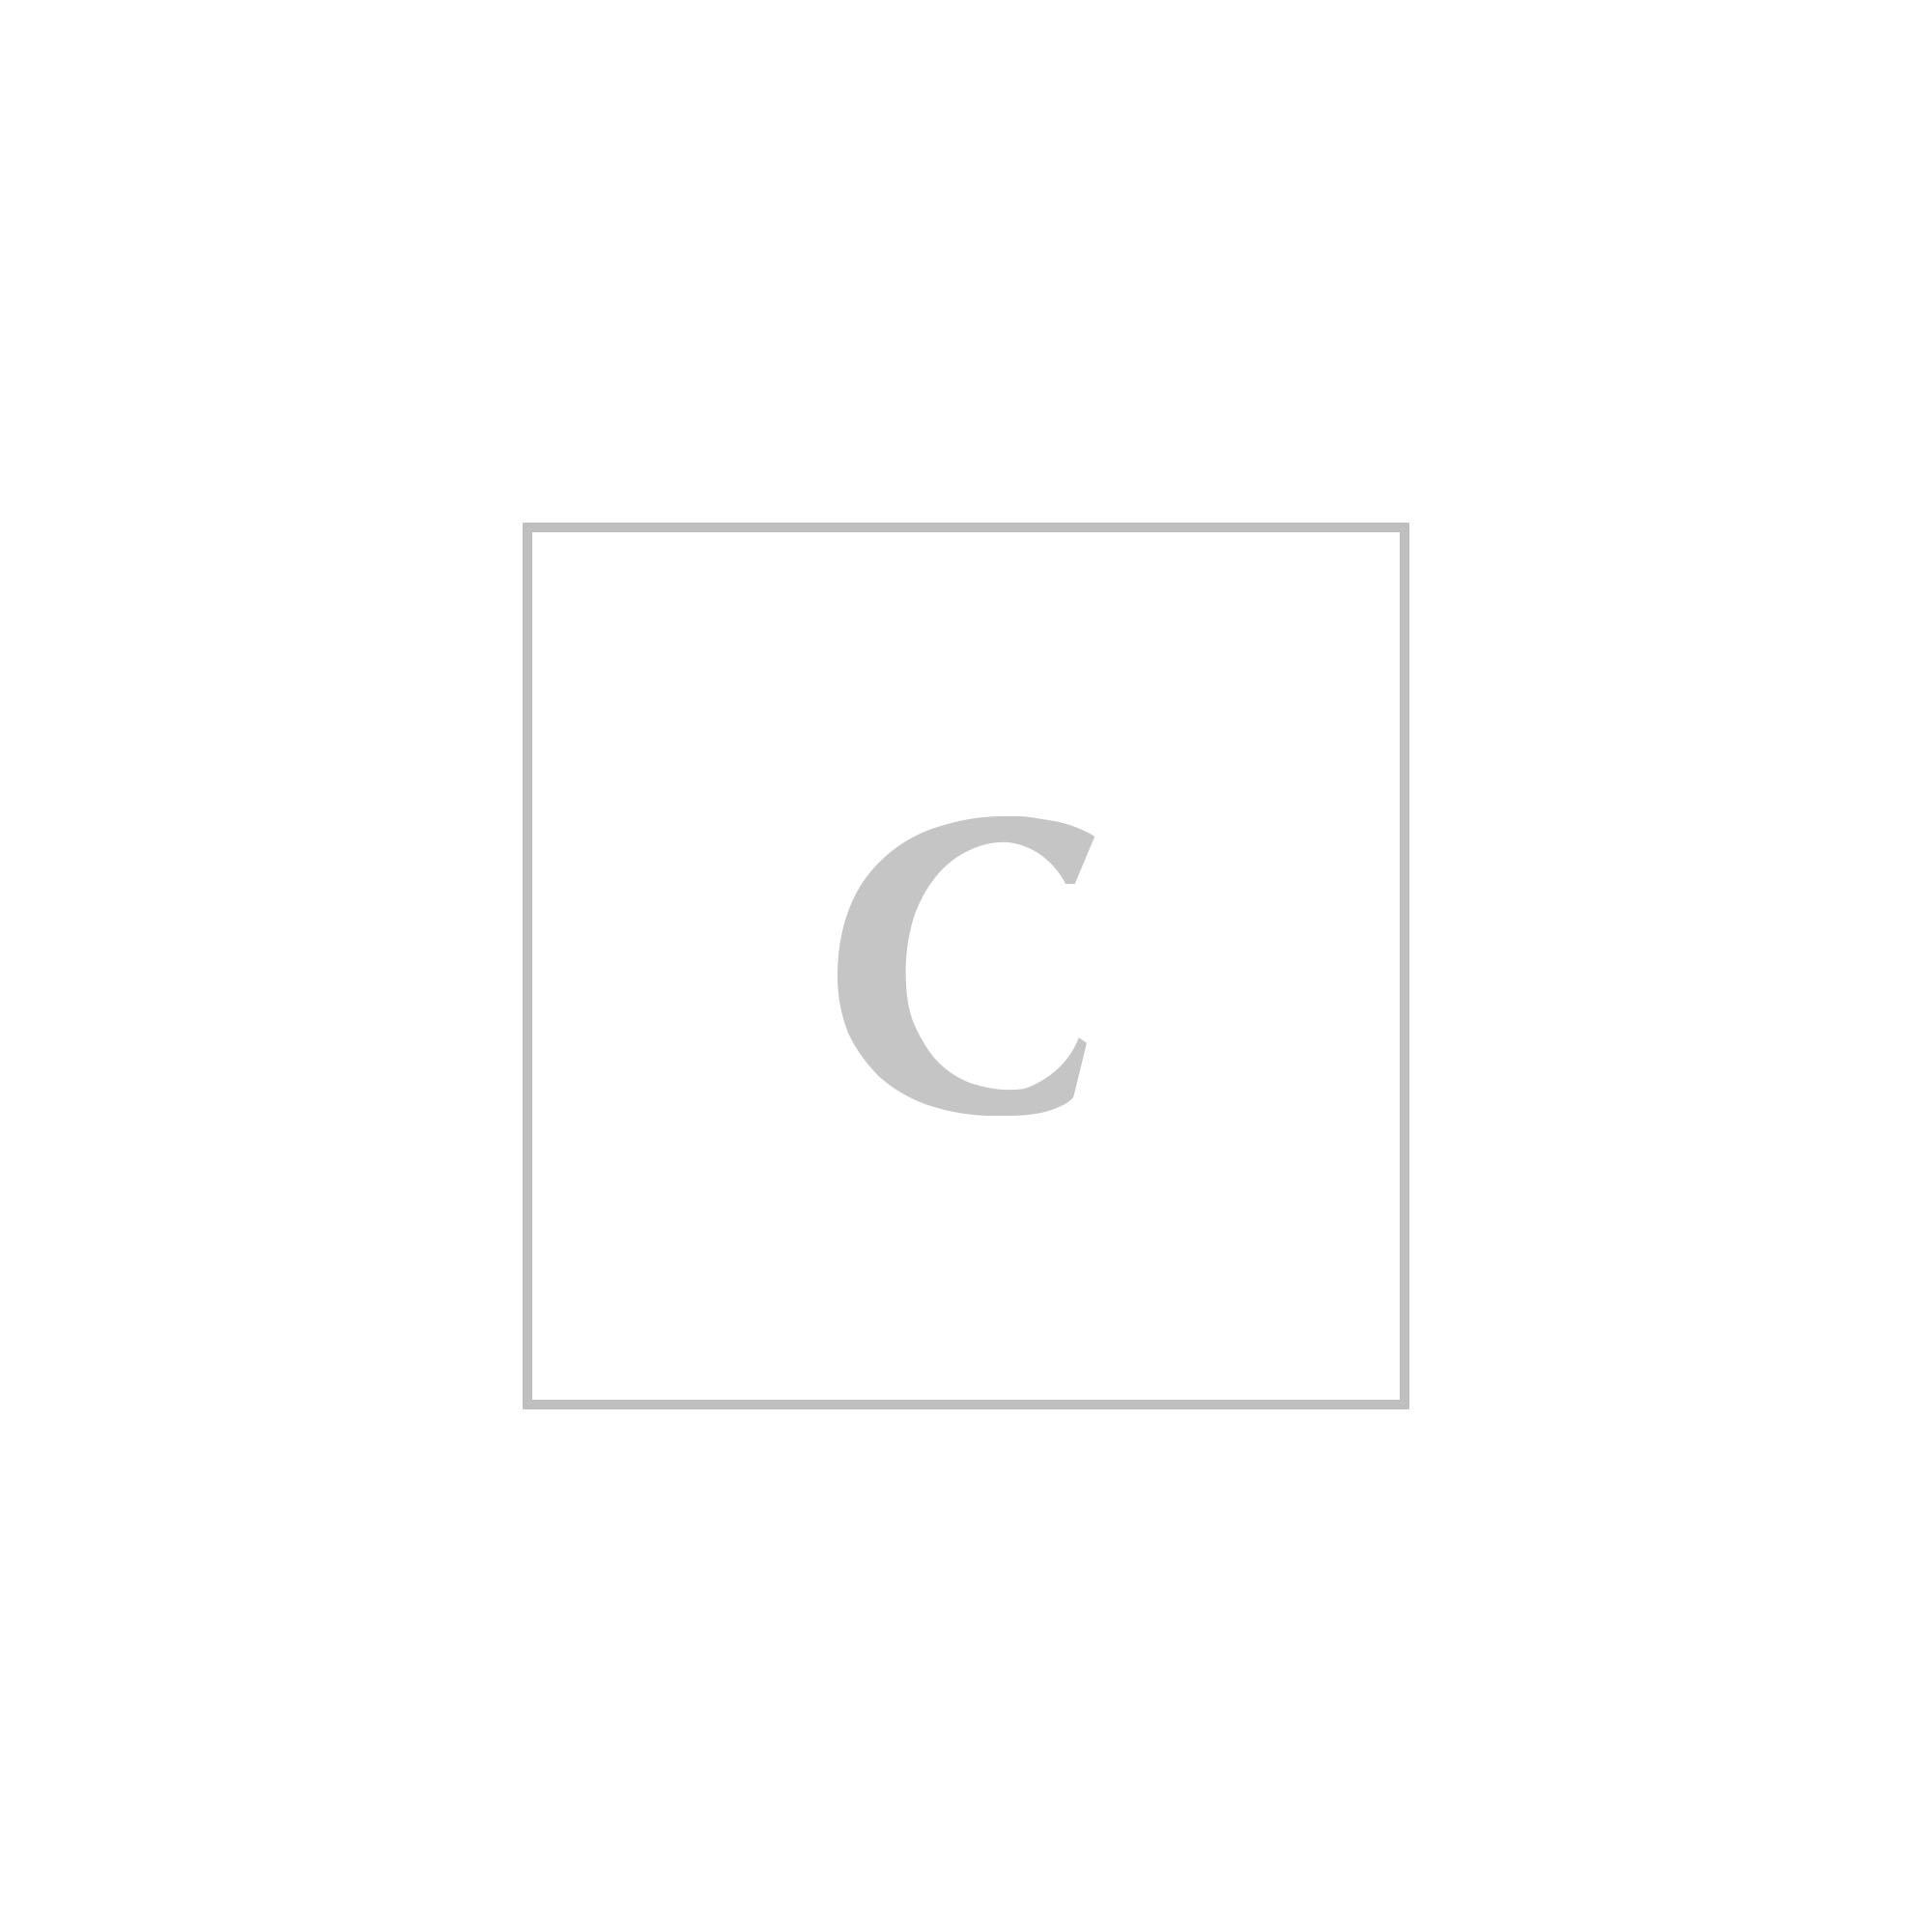 Michael michael kors logo pvc camera bag